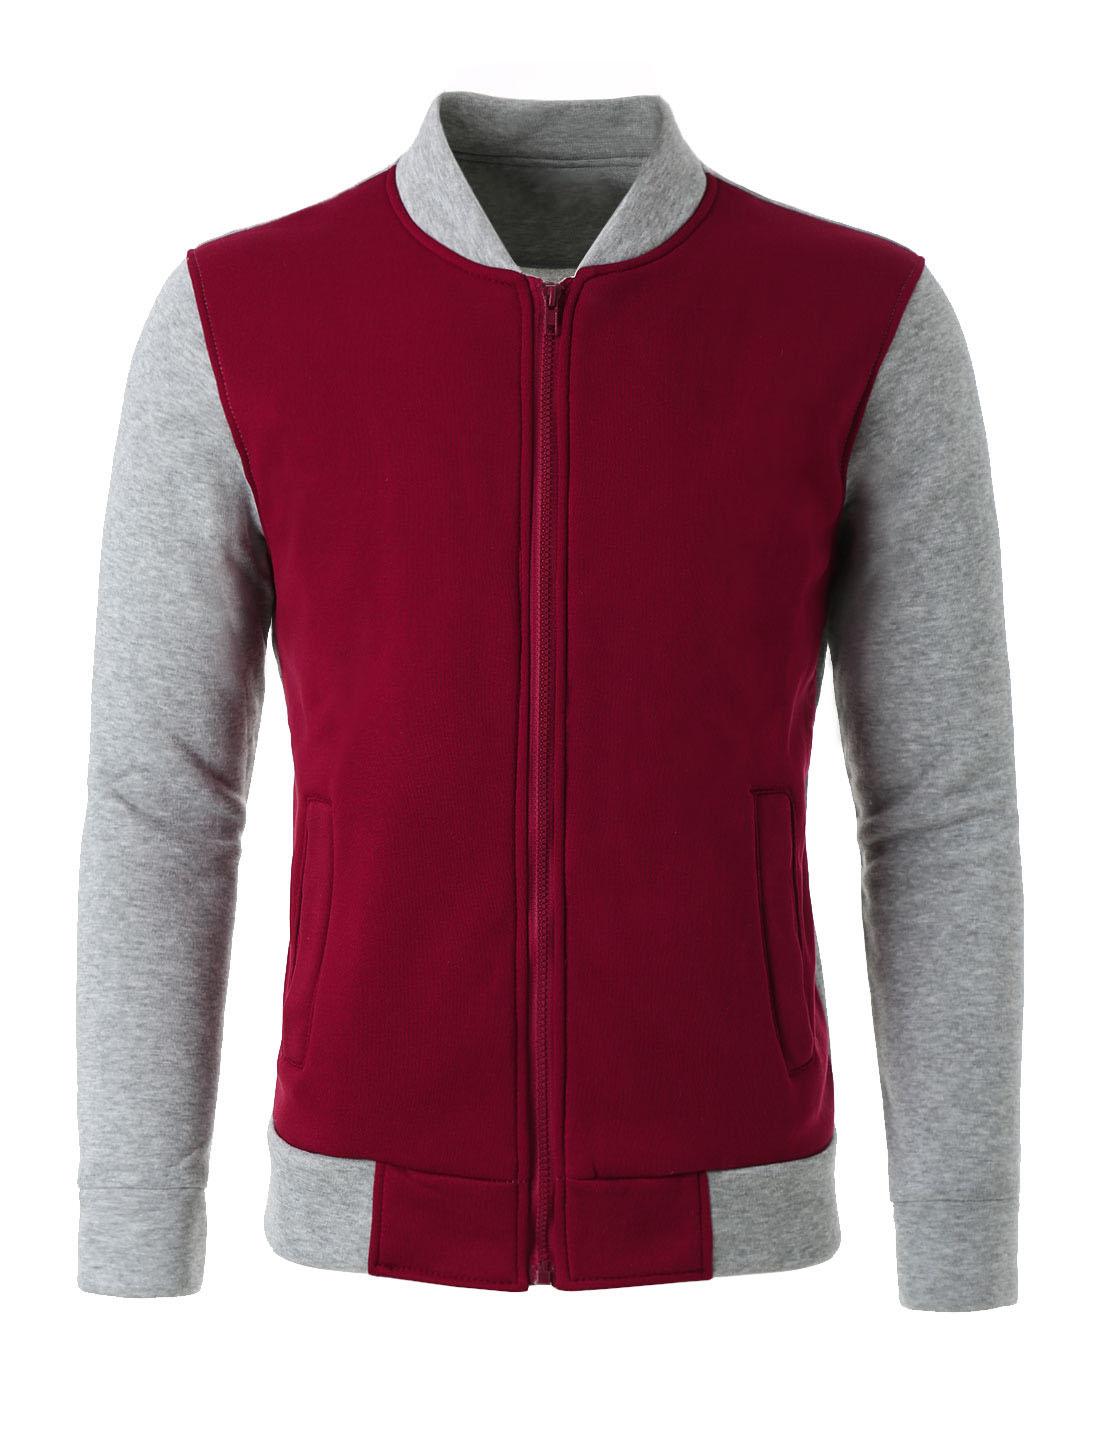 Men Color Block Stand Collar Zipper Front Long Sleeves Cozy Outdoor Varsity Jacket Burgundy Light Gray S